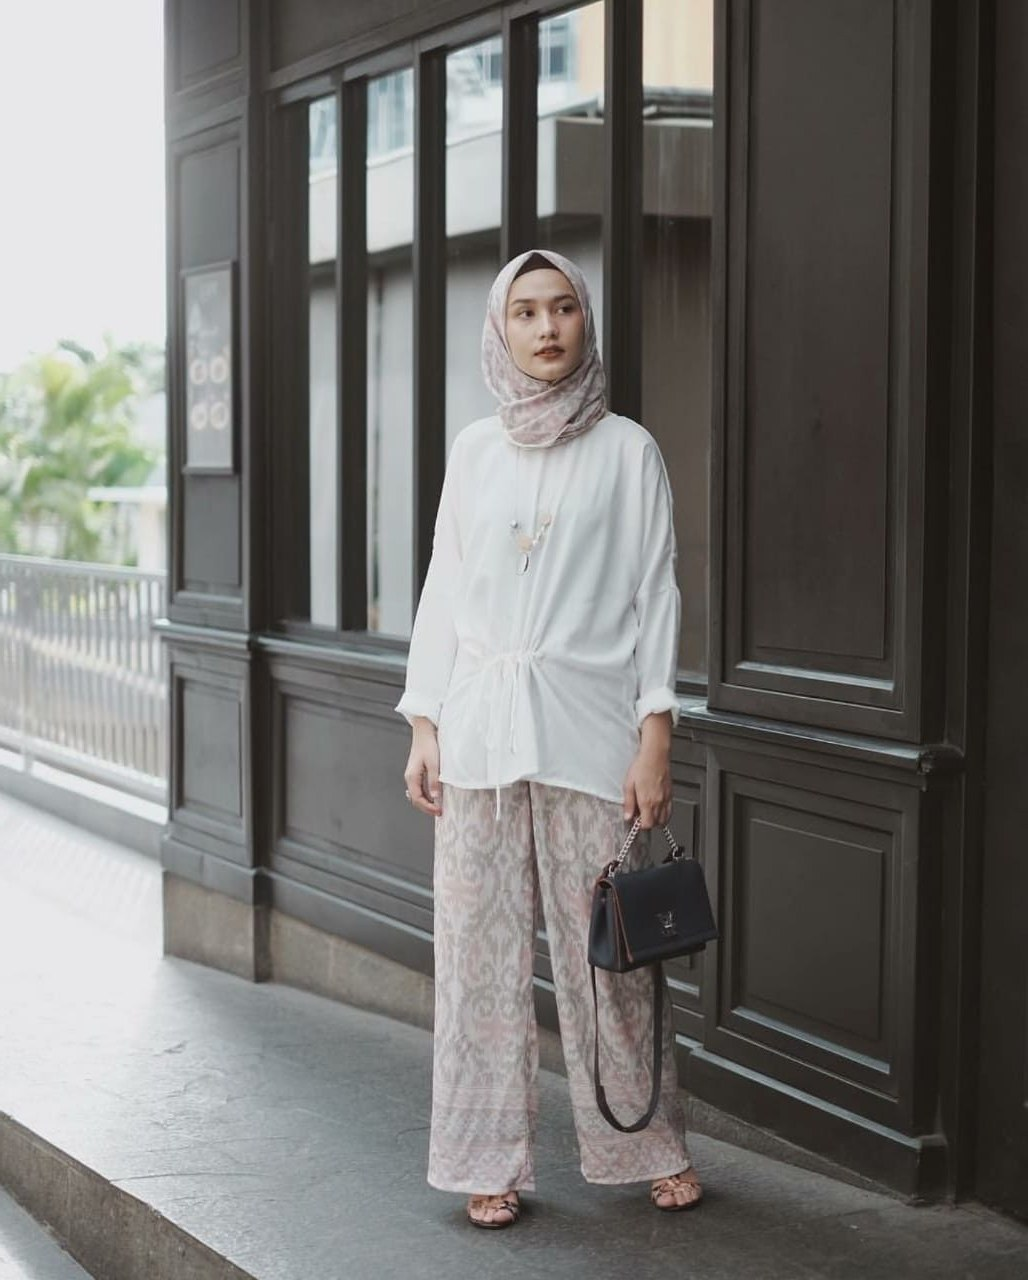 Ide Ootd Baju Lebaran Fmdf Memesona Di Hari Raya Contek 10 Style Lebaran Terkini Ala